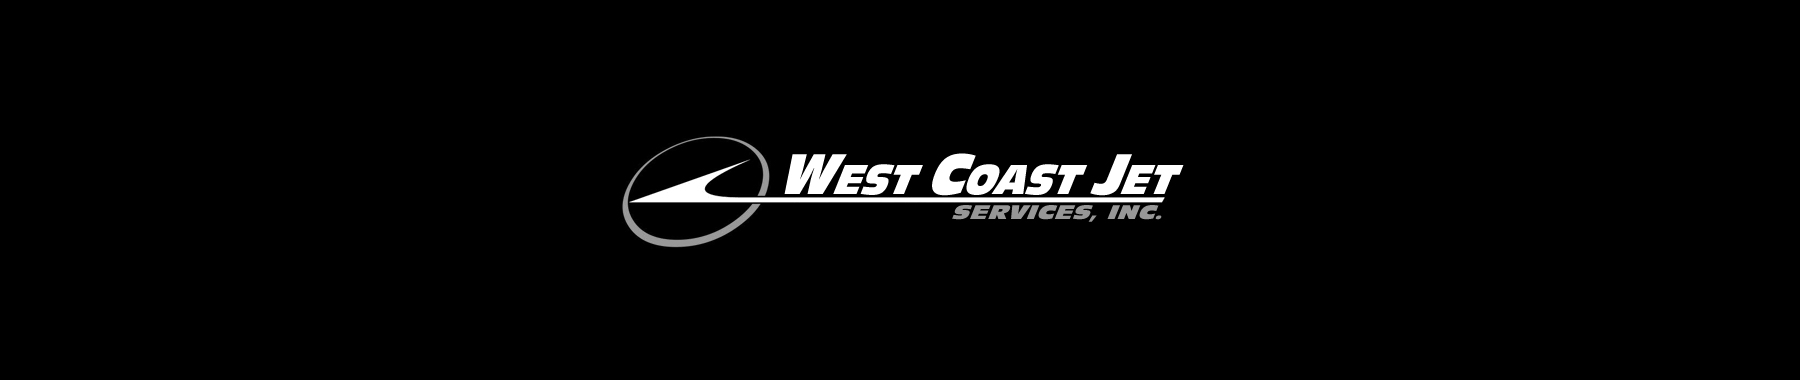 west coast jet.jpg